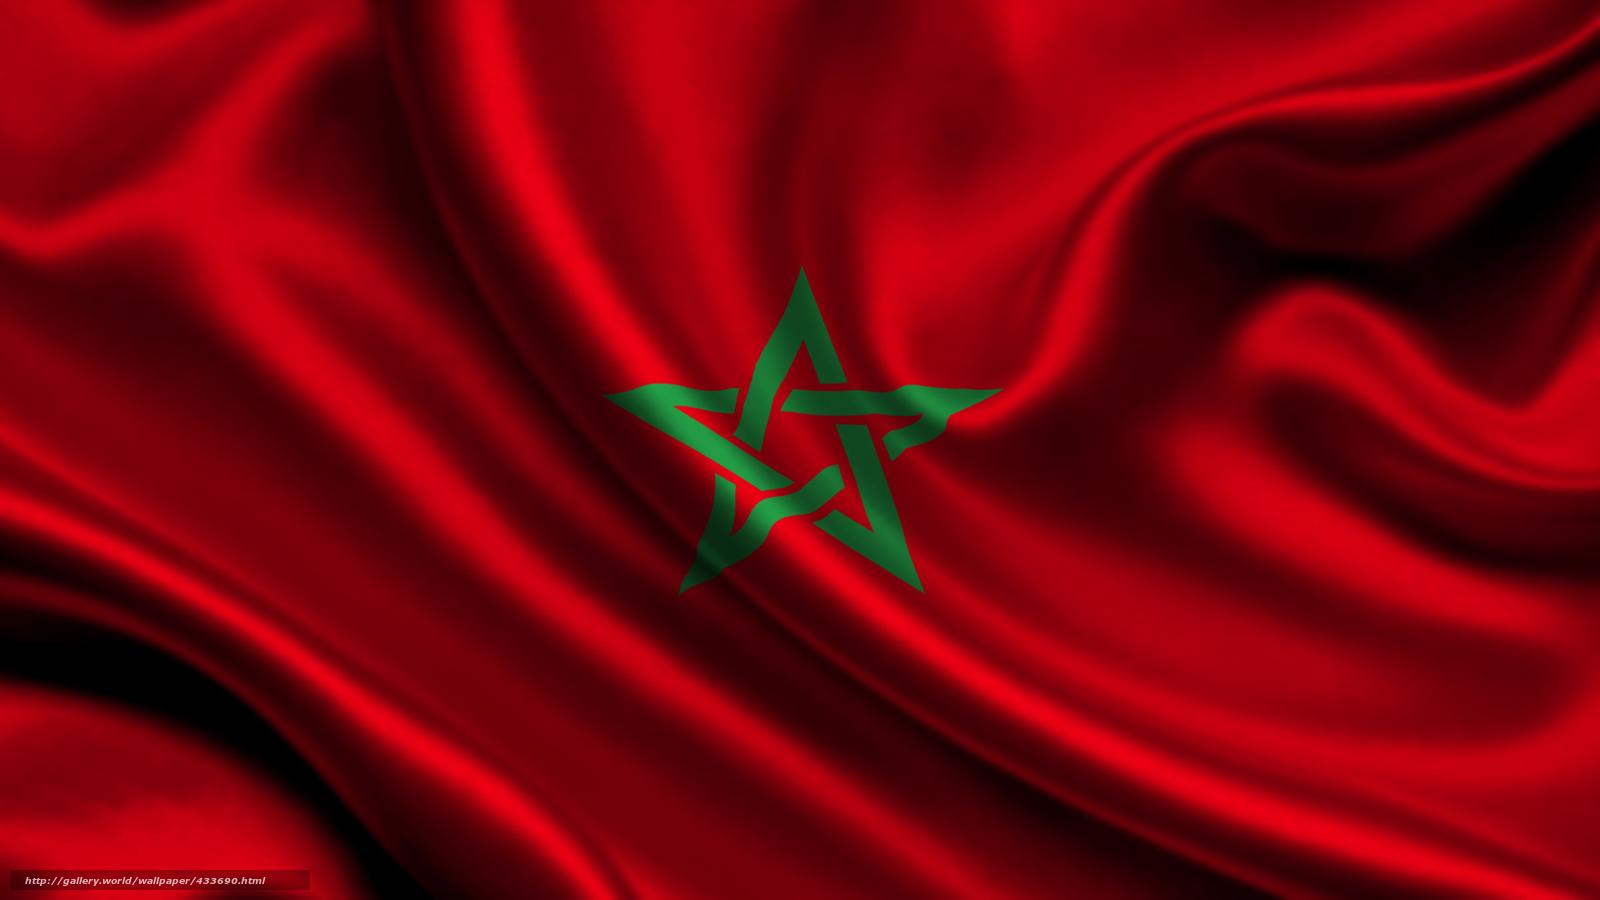 433690_morocco_satin_flag_marokko_atlasa_flag_1920x1080_www.Gde-Fon.com